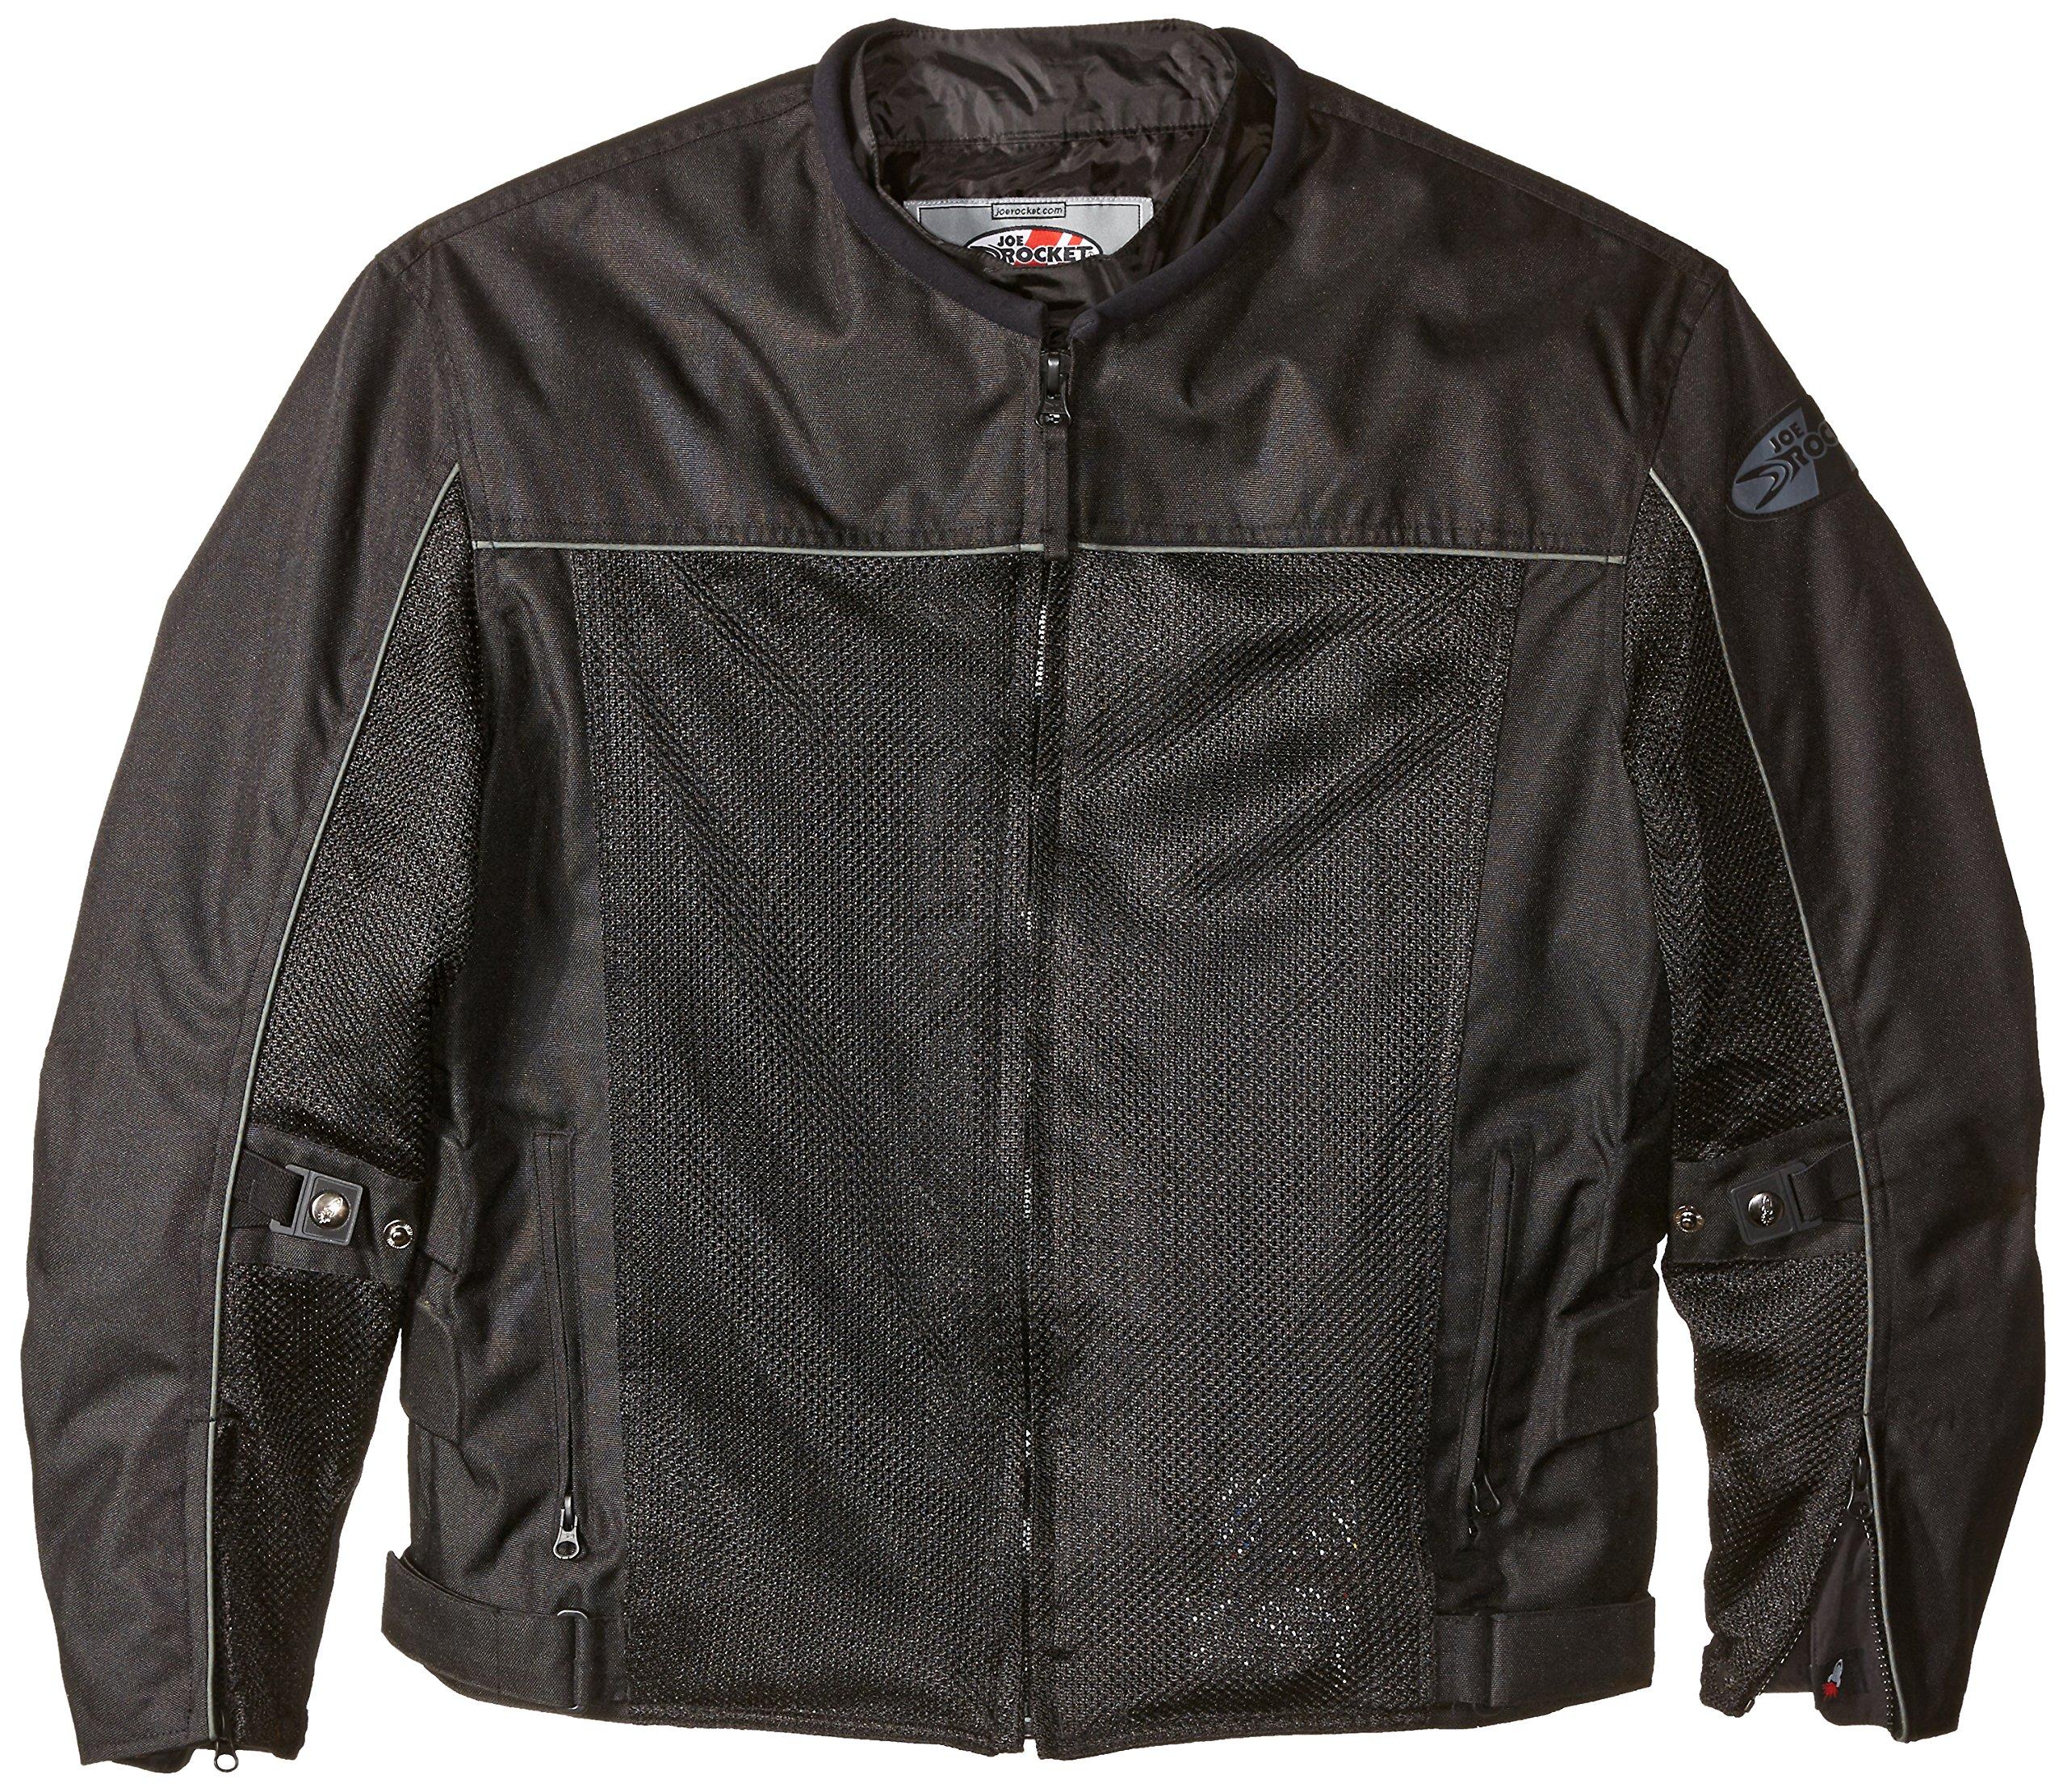 Joe Rocket Velocity Men's Mesh Riding Jacket (Black, X-Large)